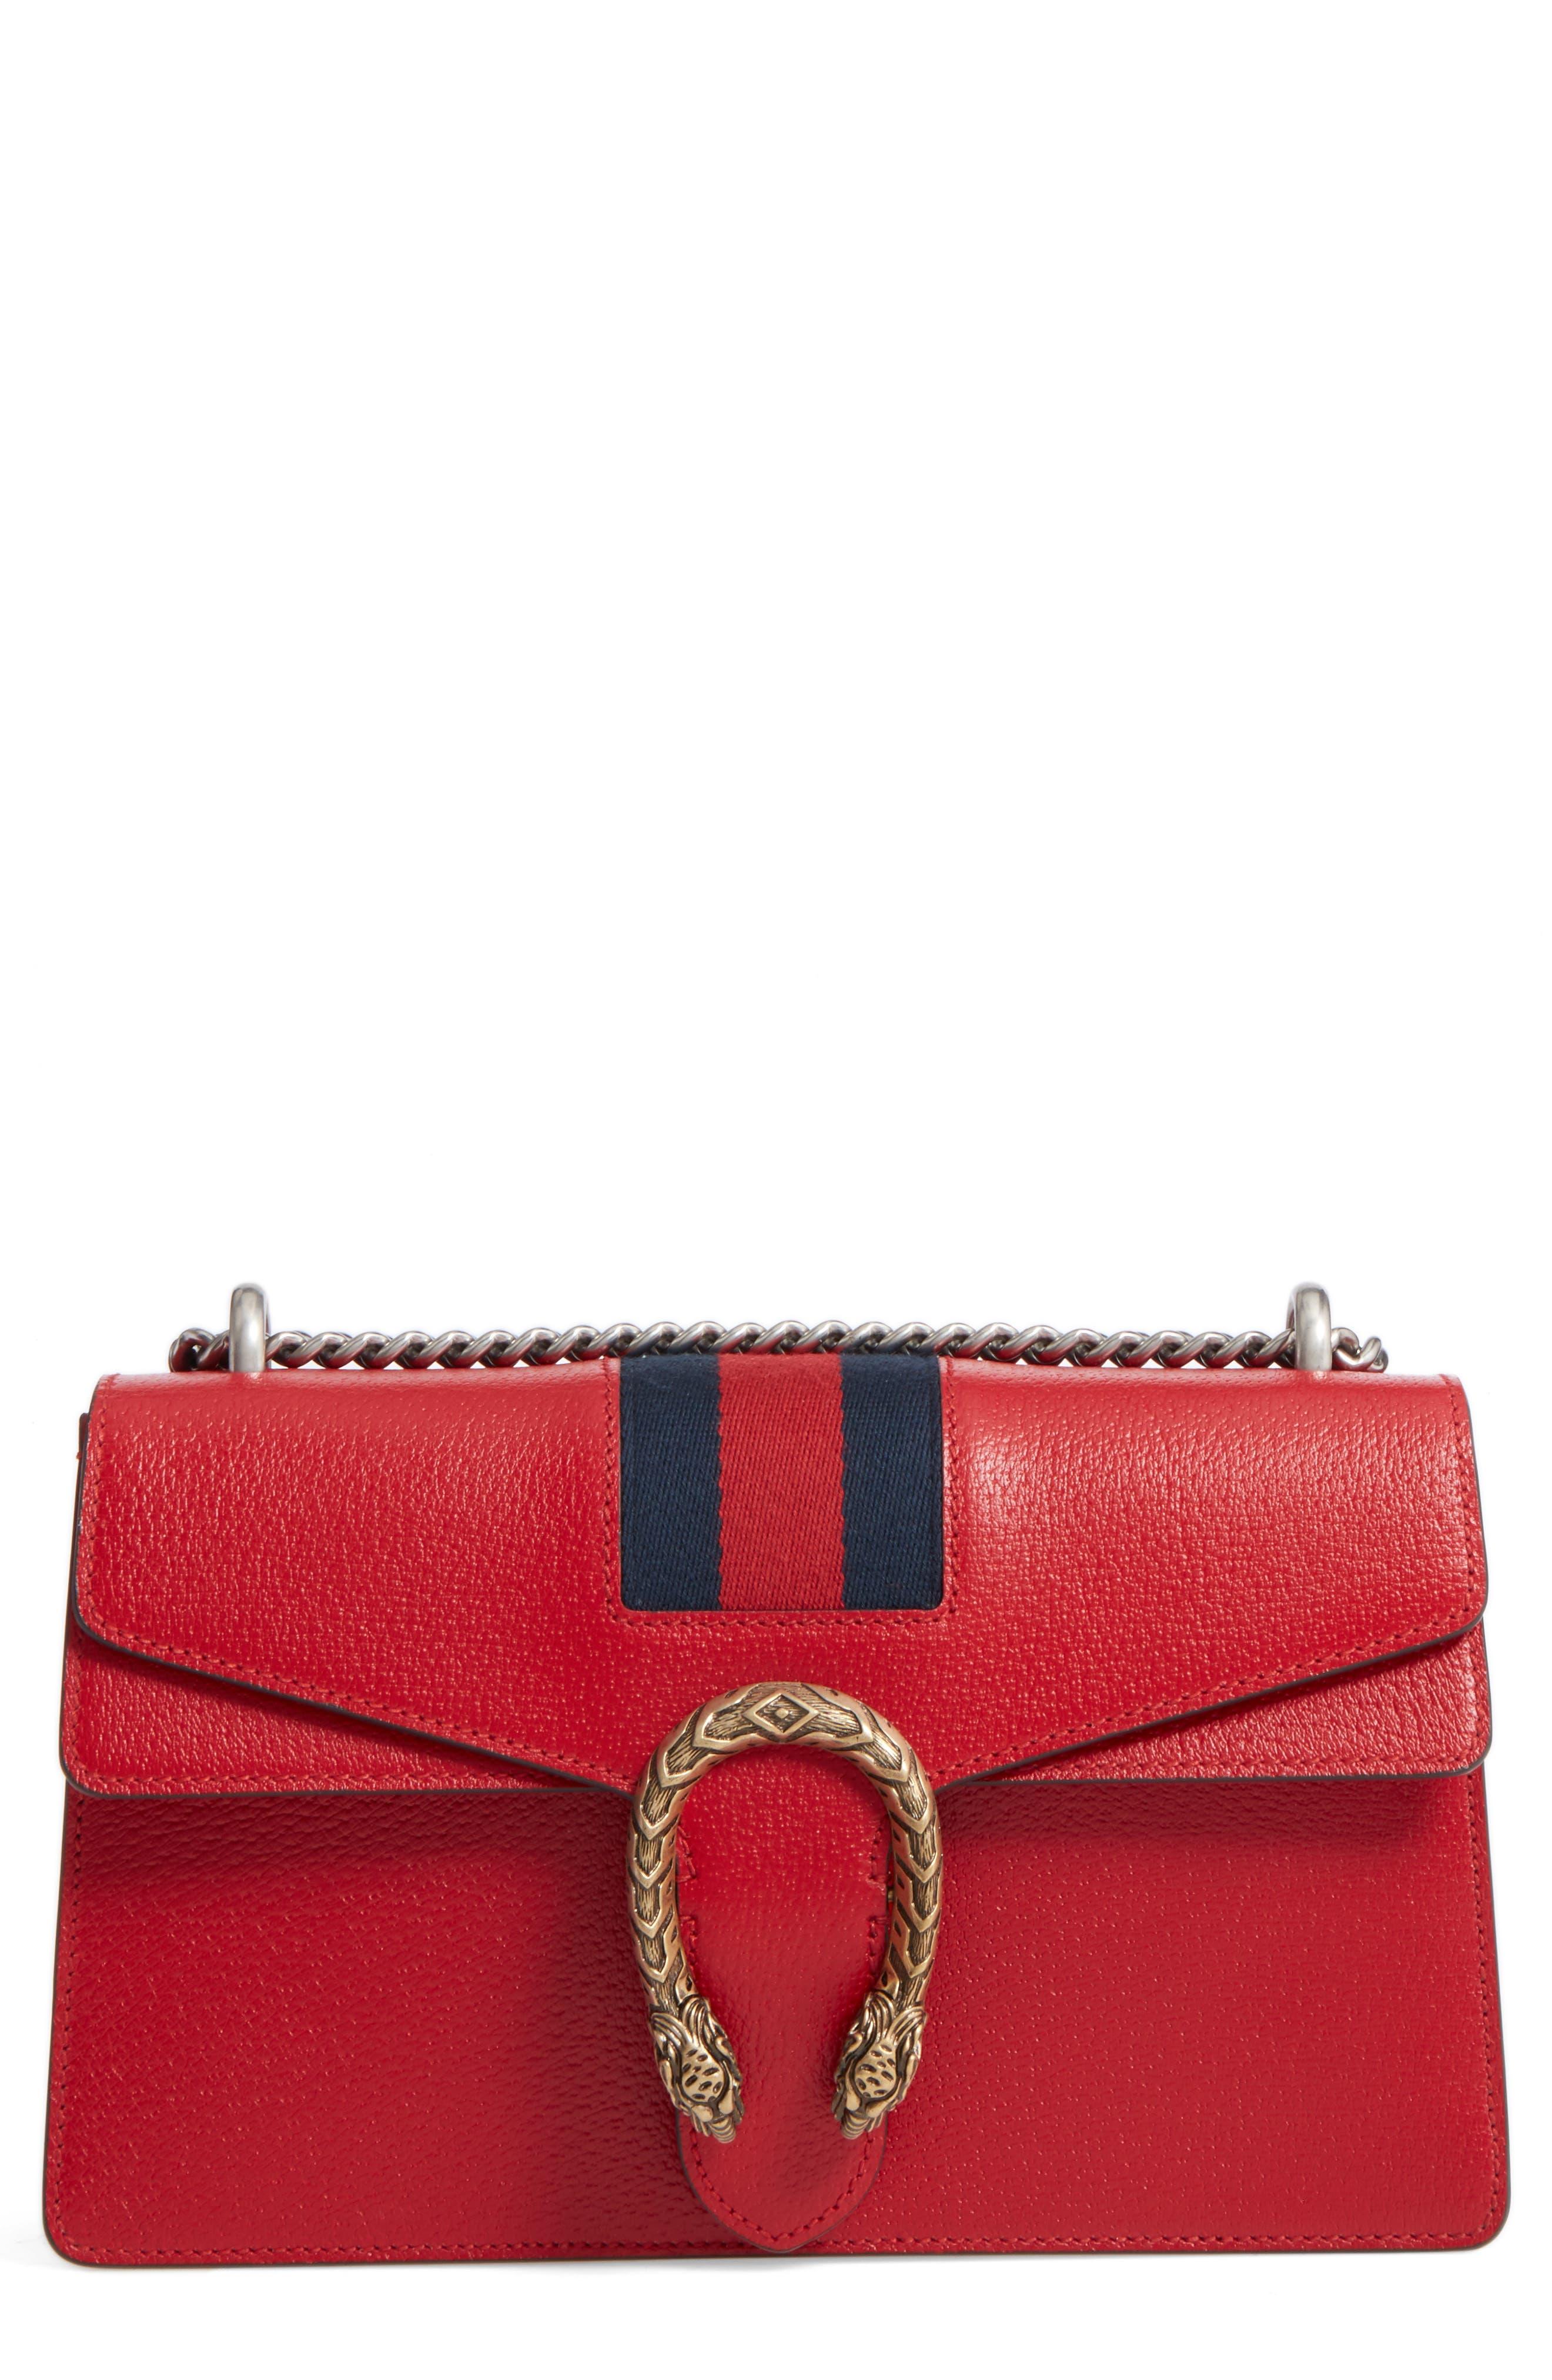 Main Image - Gucci Dionysus Leather Shoulder Bag